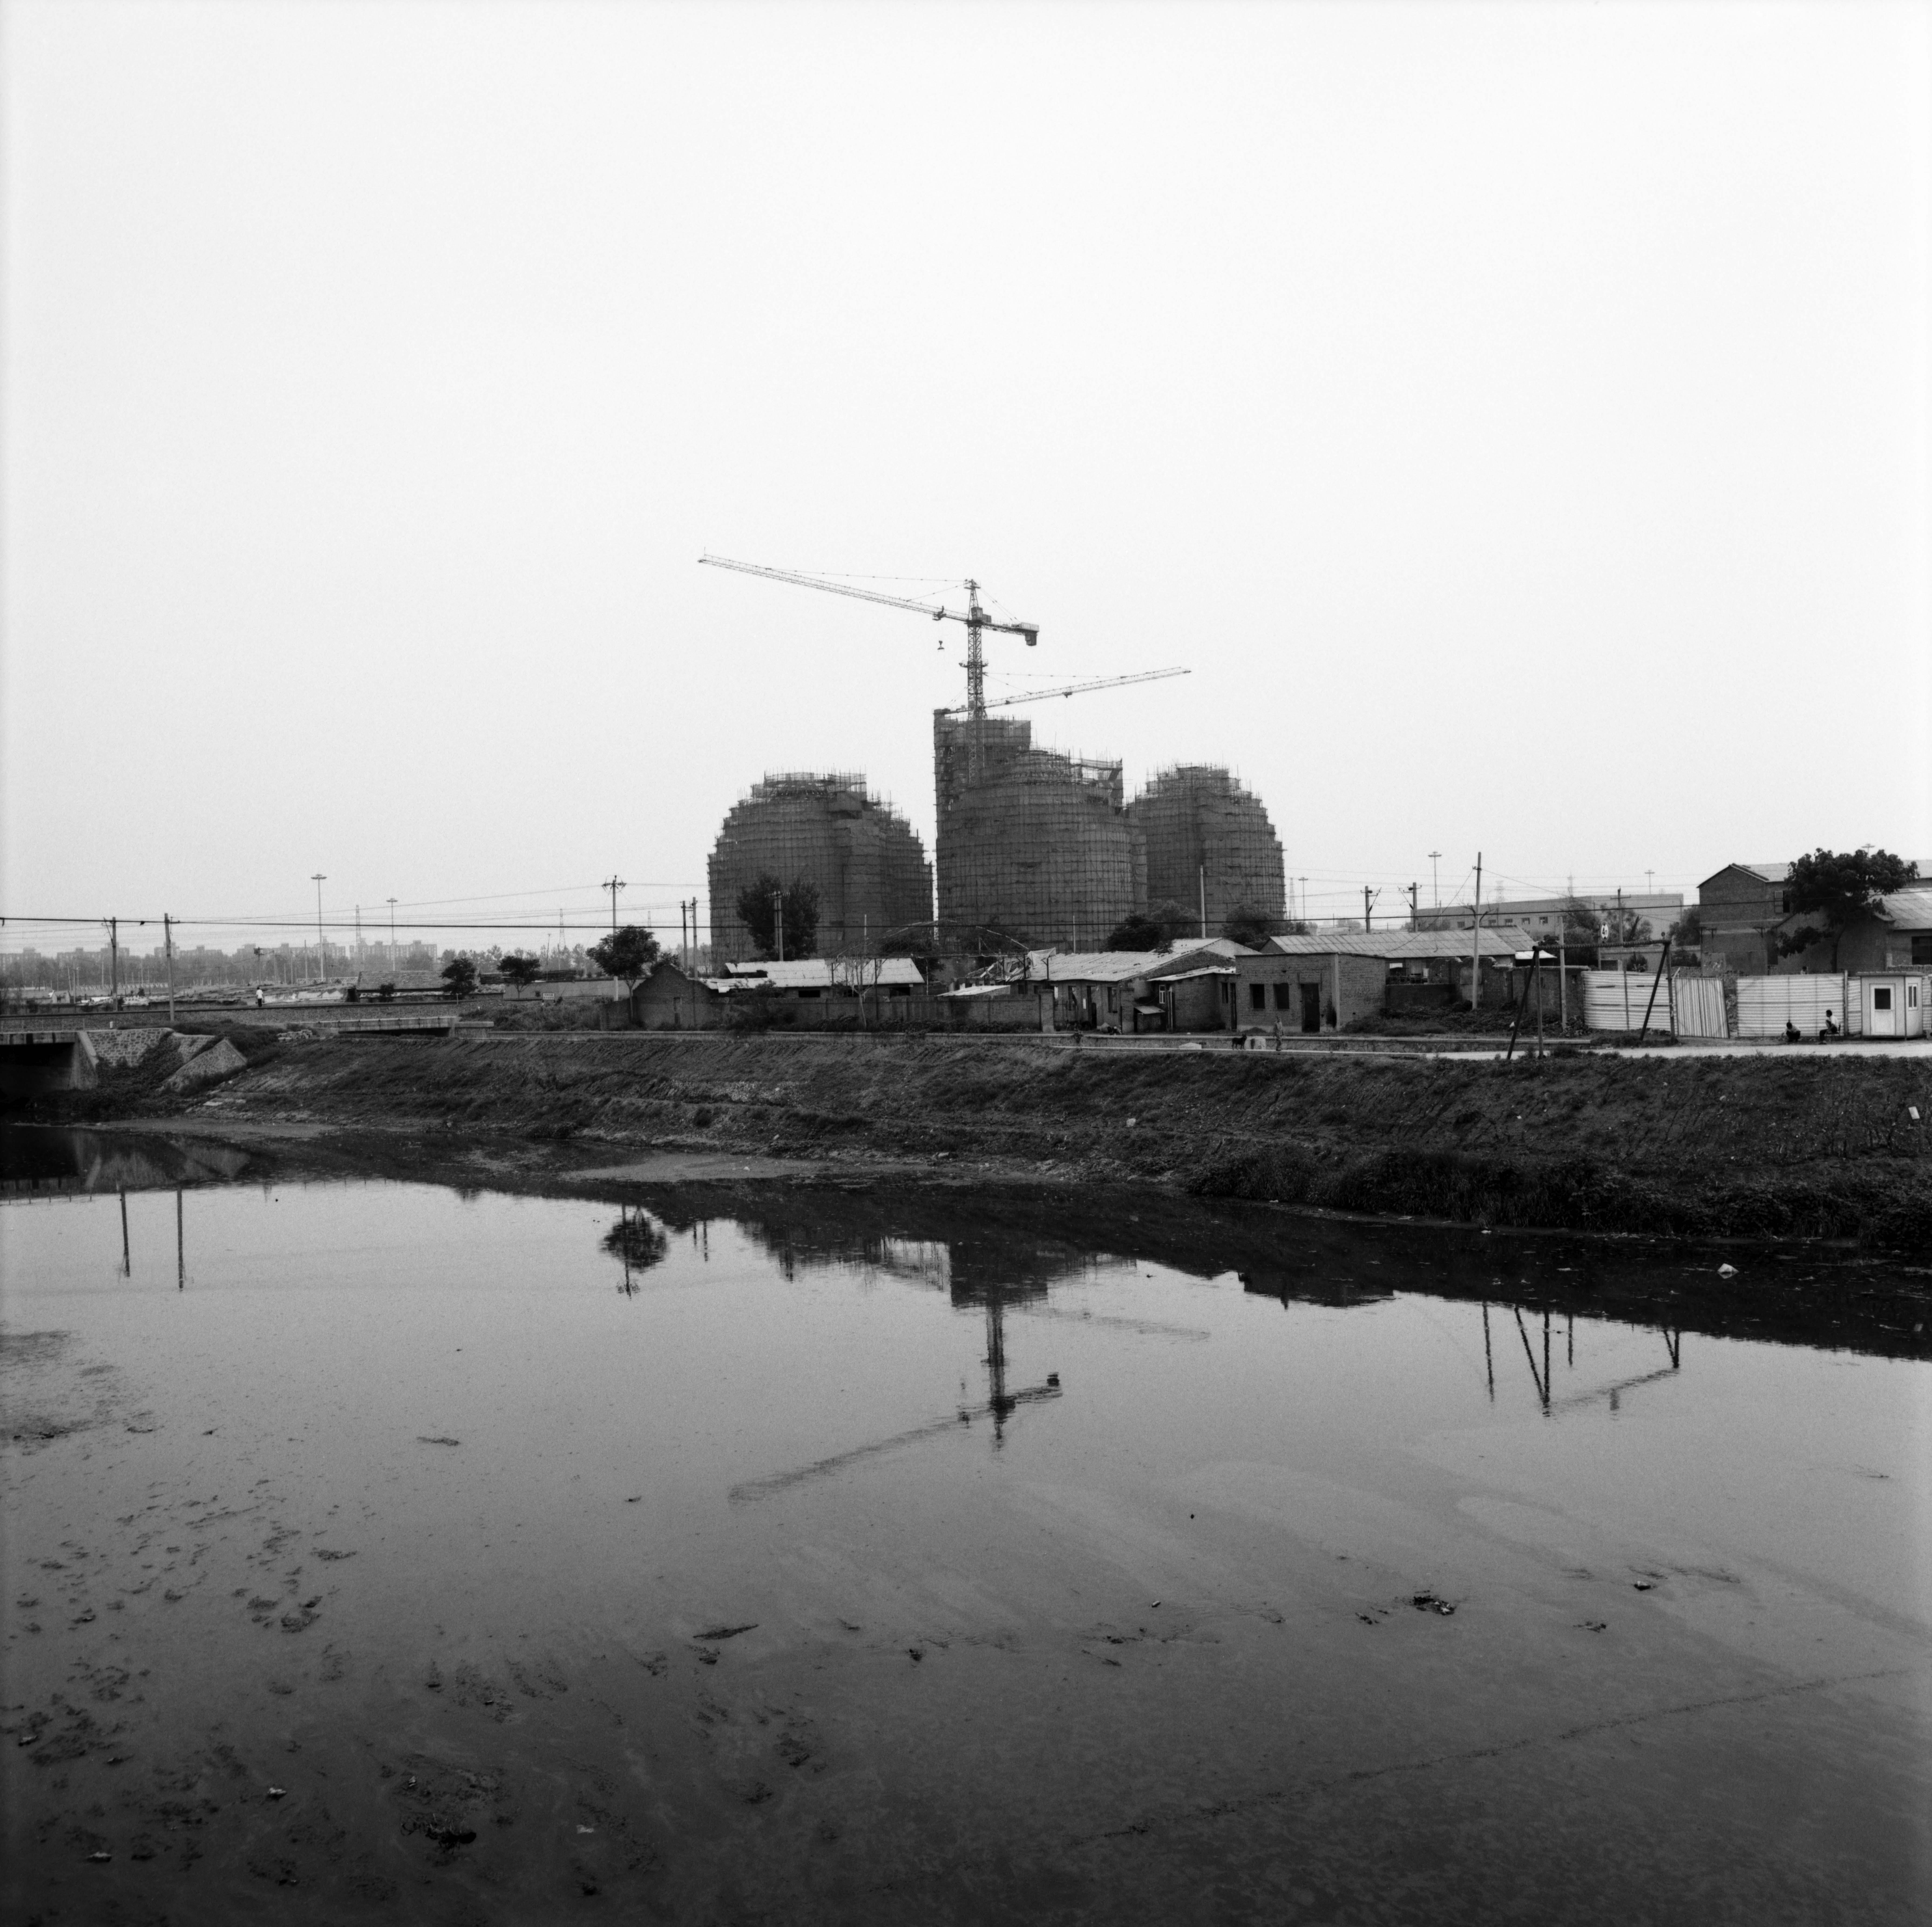 Costantino Ciervo, Serie Beijing 2006, No 9